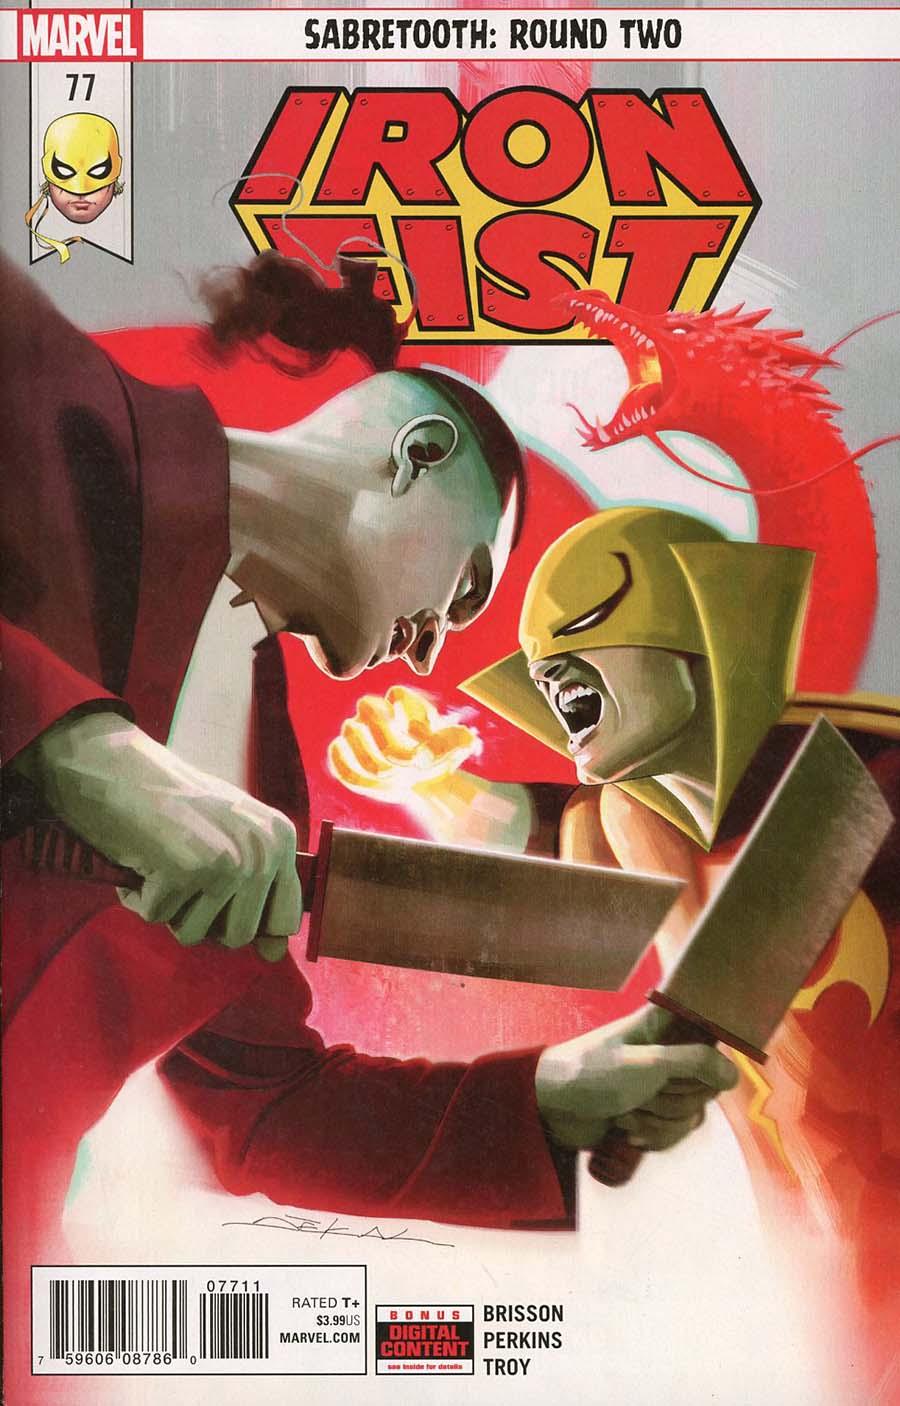 Iron Fist Vol 5 #77 (Marvel Legacy Tie-In)